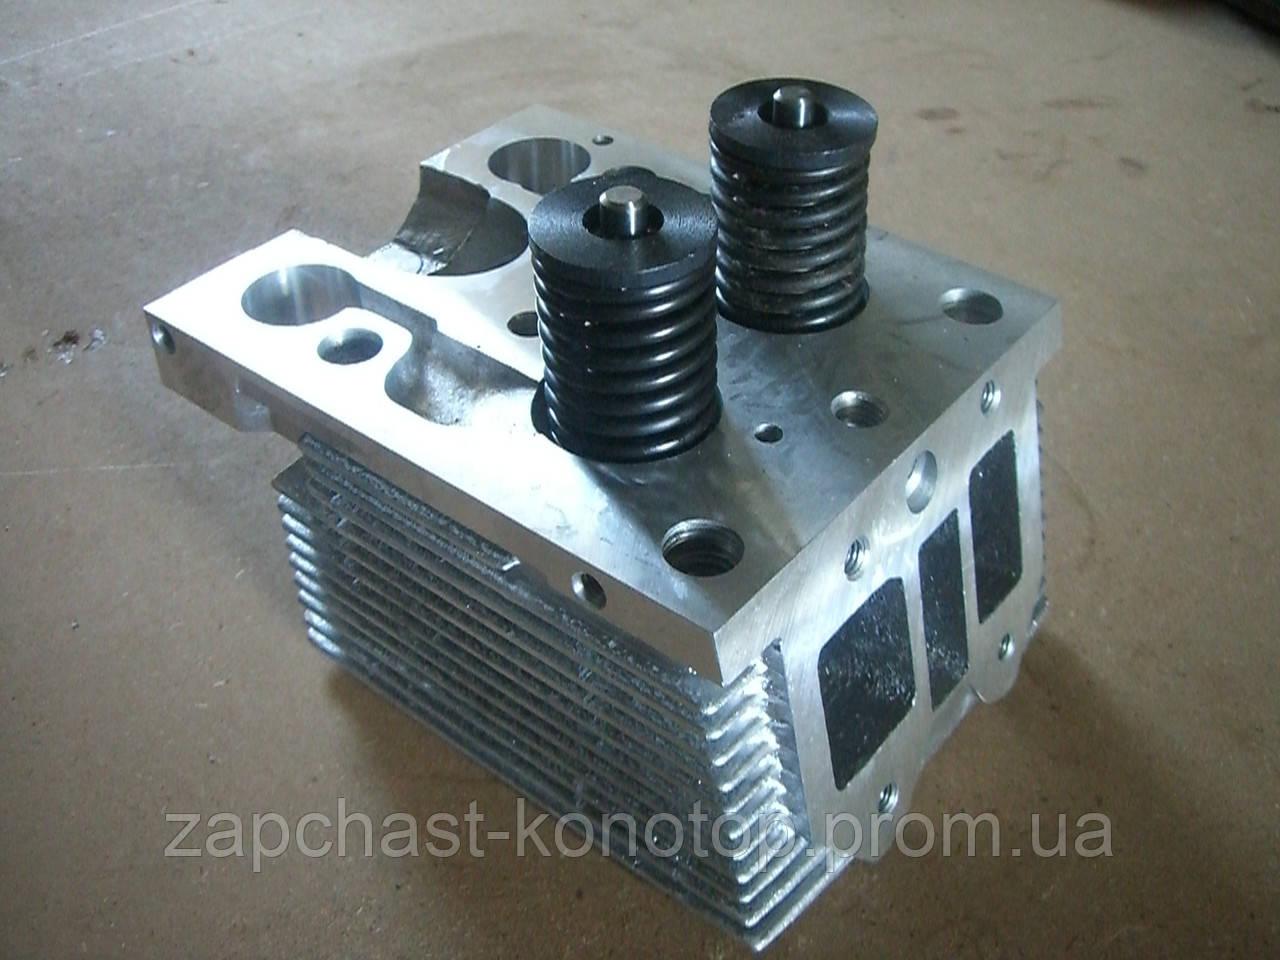 Головка блока Д-144 Д37М-1003008-Б5 трактора Т-40 (Оригинал!!!)